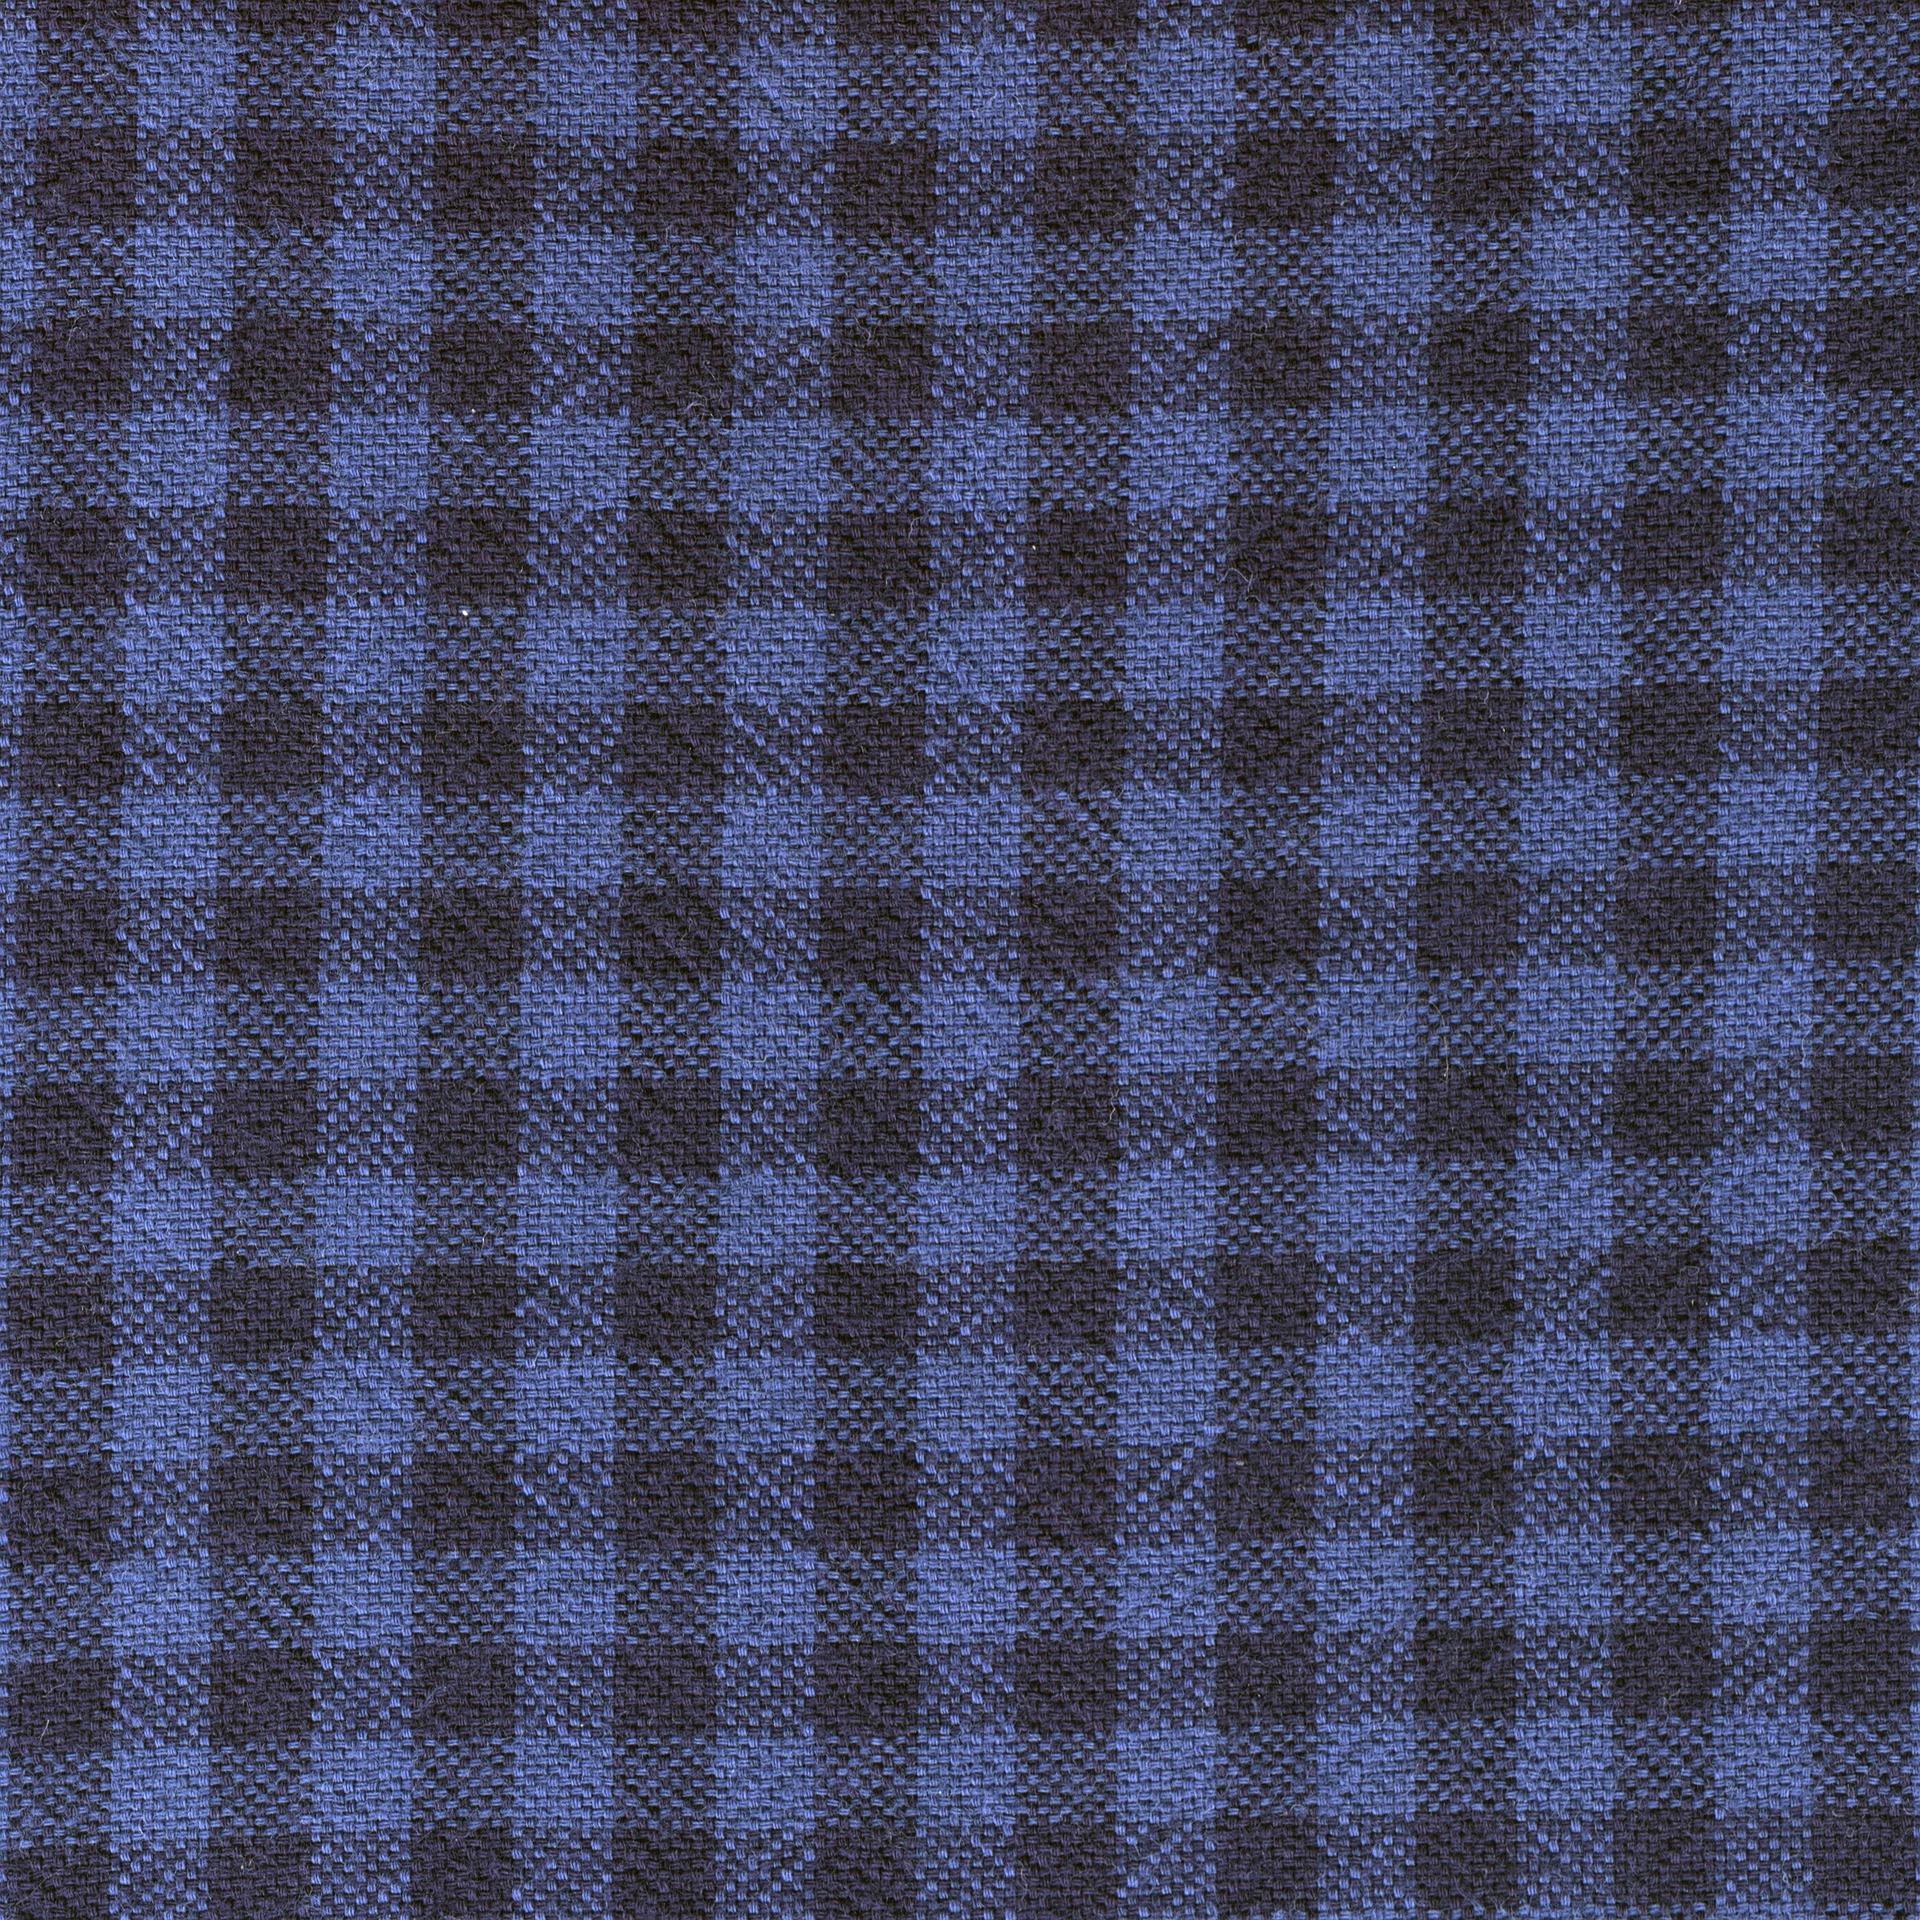 sew handwoven fabric.